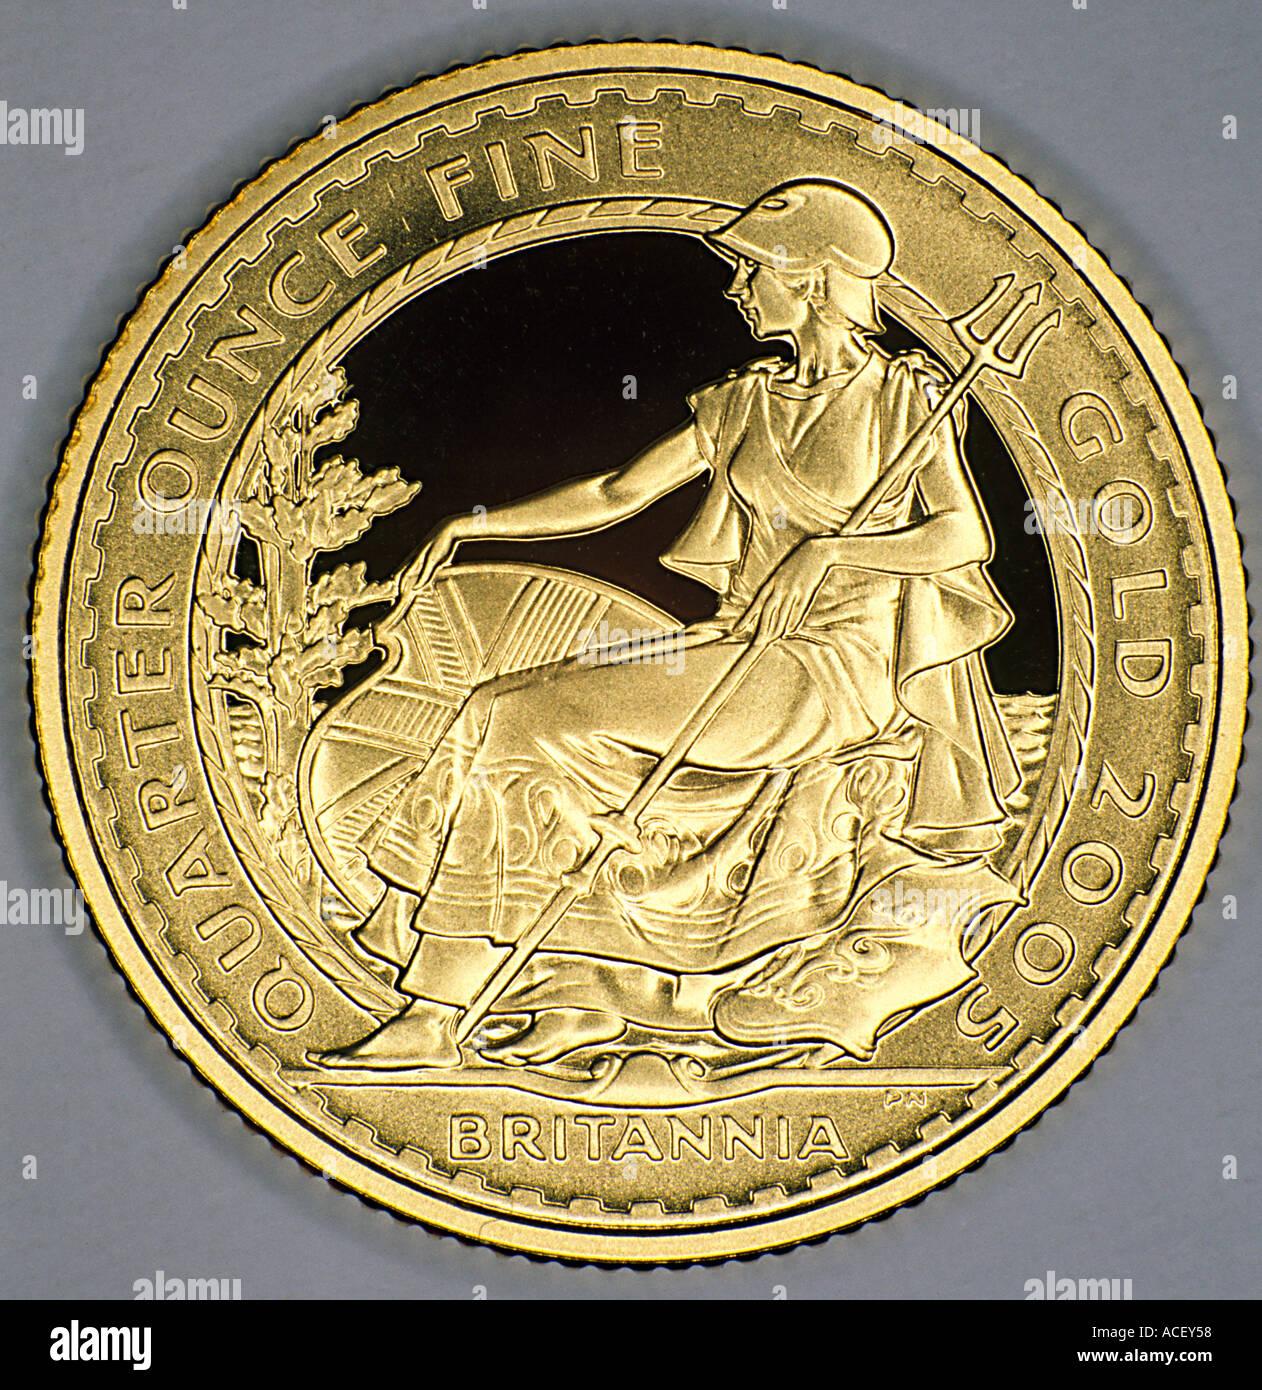 Moneta di Britannia Immagini Stock